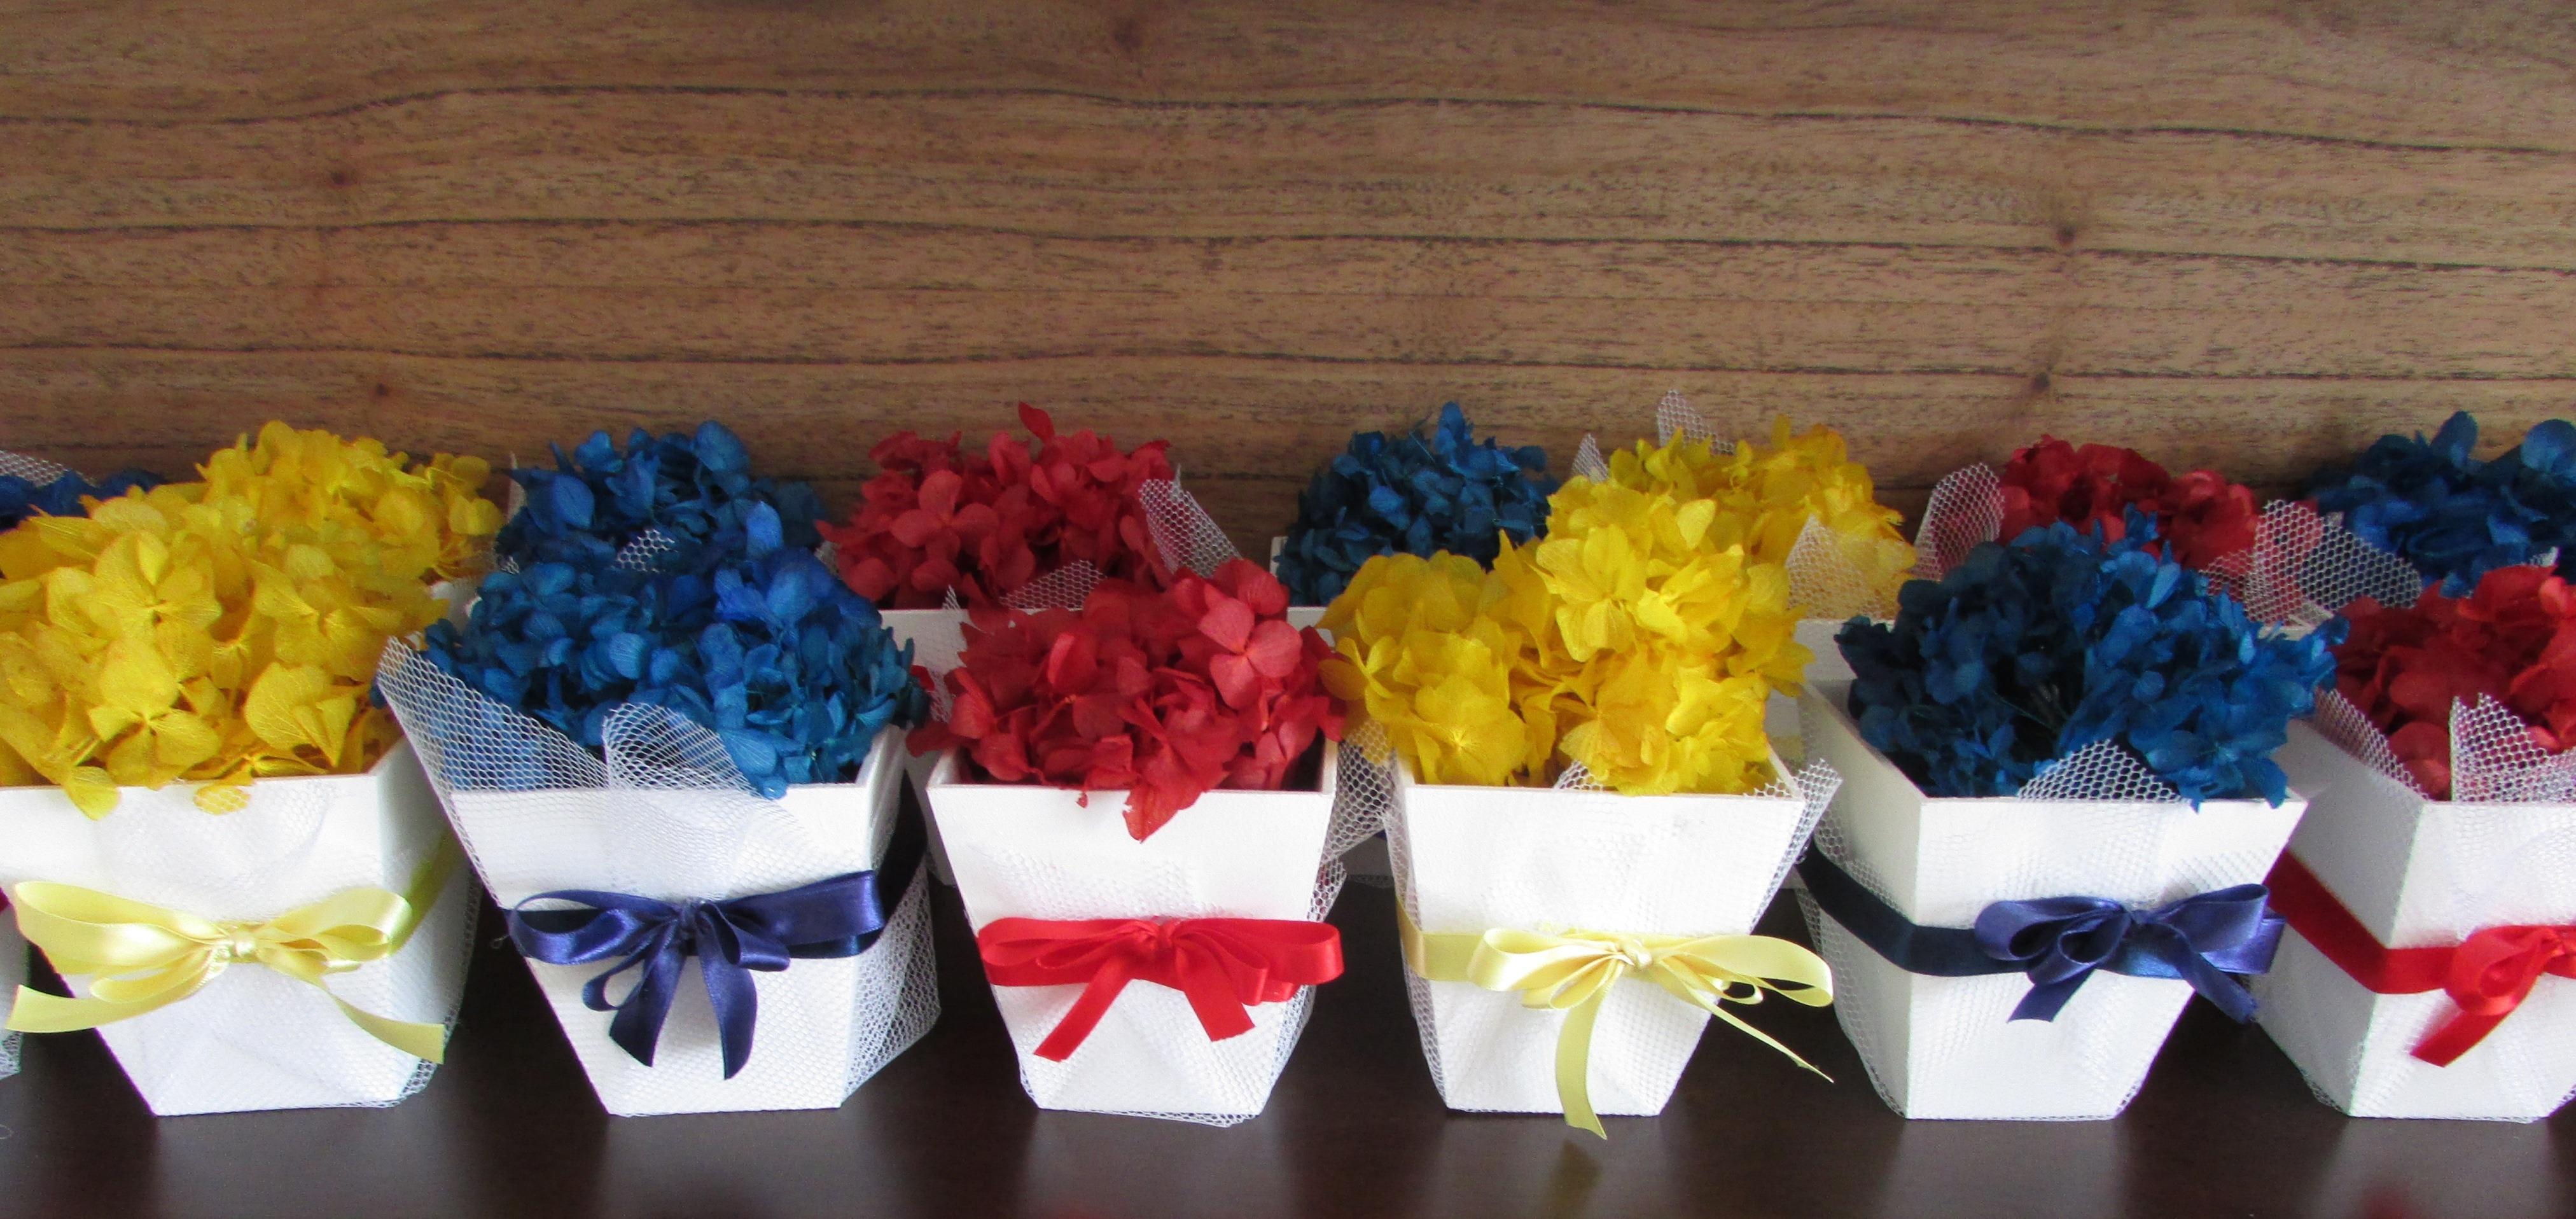 decoracao festa infantil azul e amarelo : decoracao festa infantil azul e amarelo:arranjo amarelo hortencia arranjo amarelo hortencia arranjo amarelo